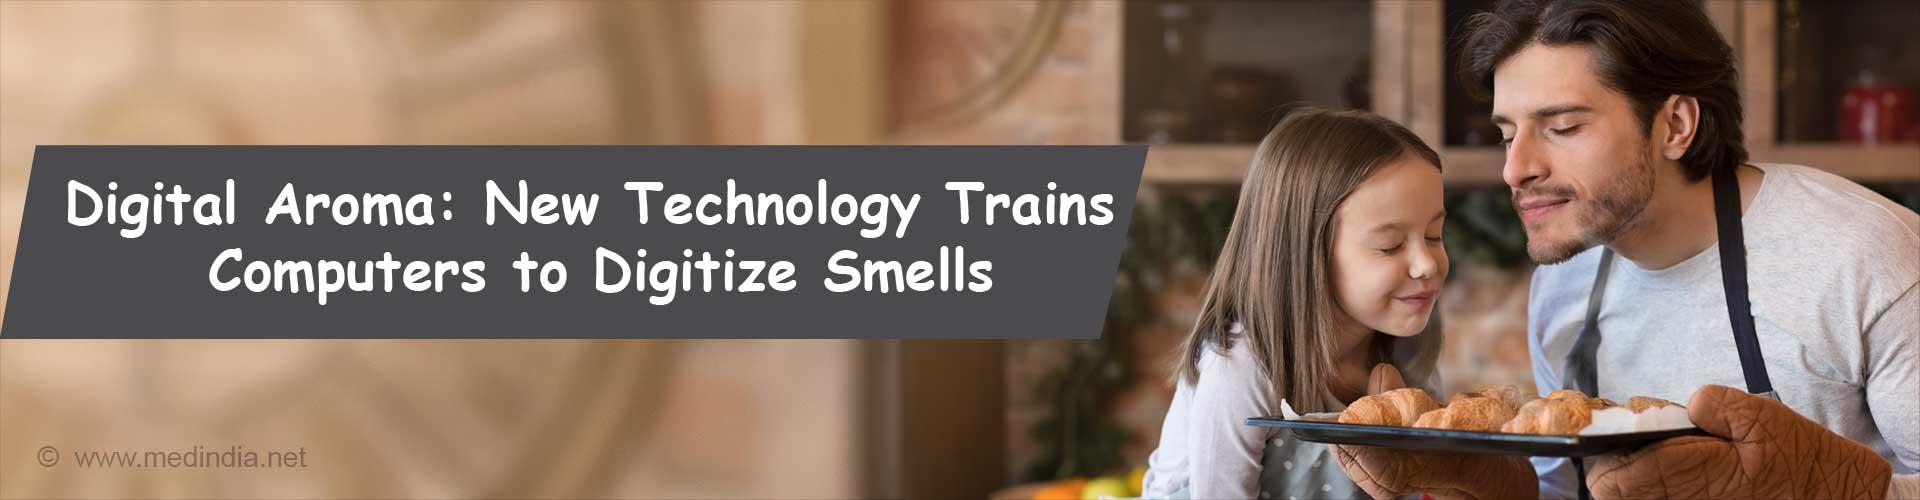 Digital Aromas - Deciphers New Era of Technology